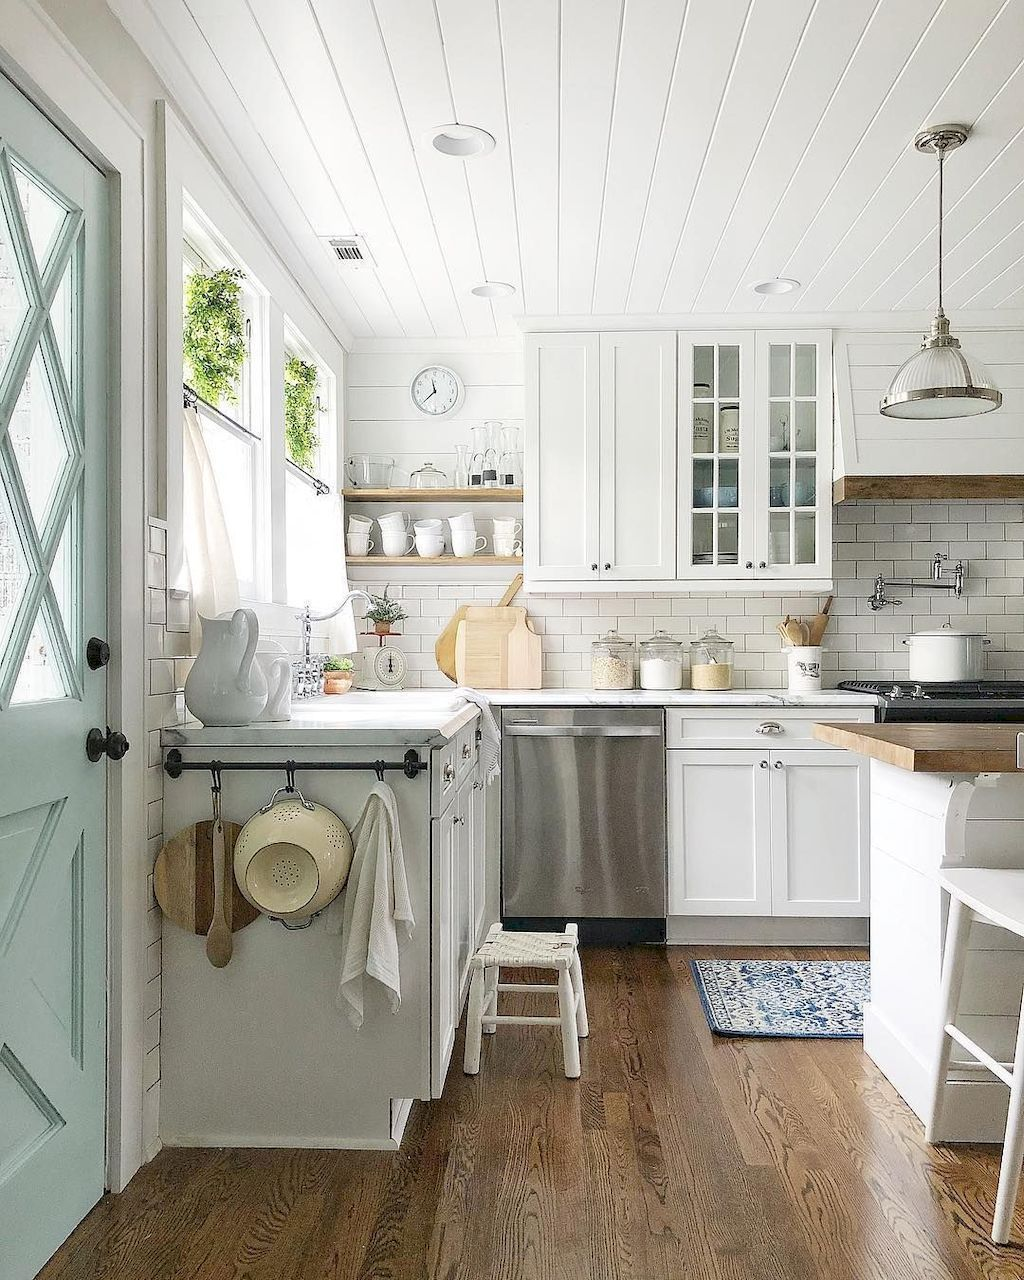 Best Rustic Farmhouse Kitchen Cabinets In List 54 Decoration De